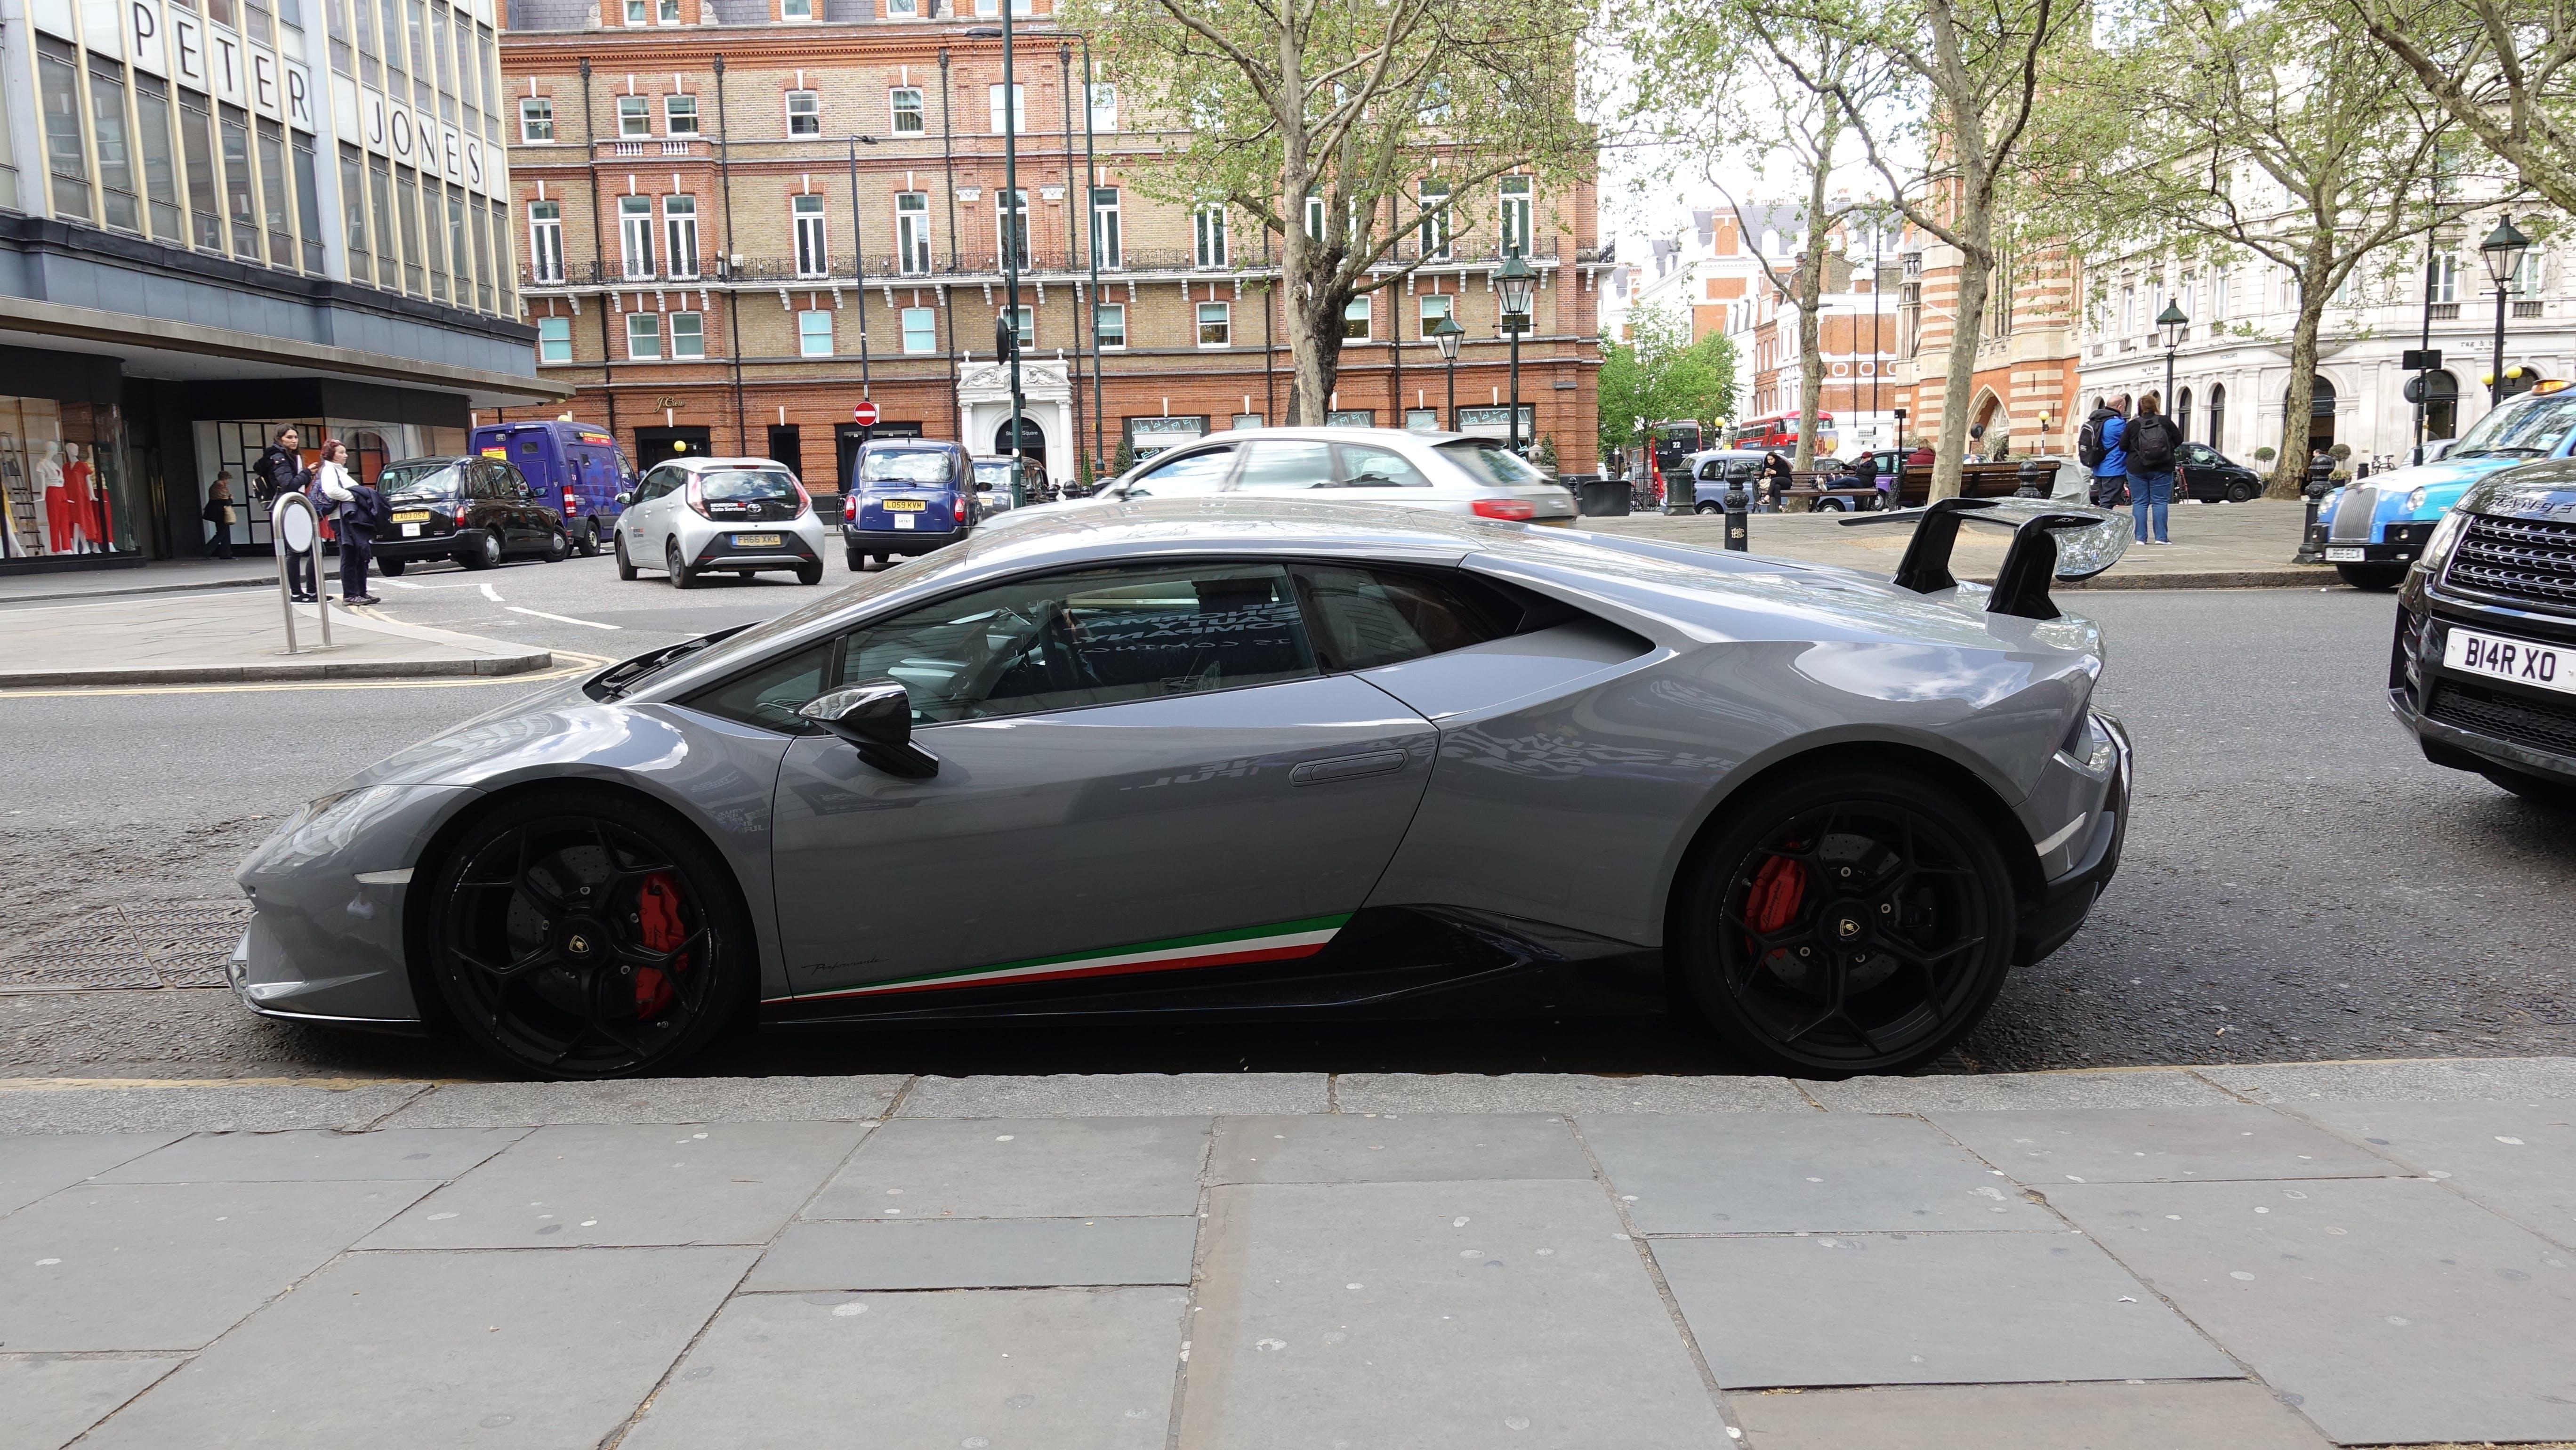 Free stock photo of Lamborghini, luxury, luxury car, sports car